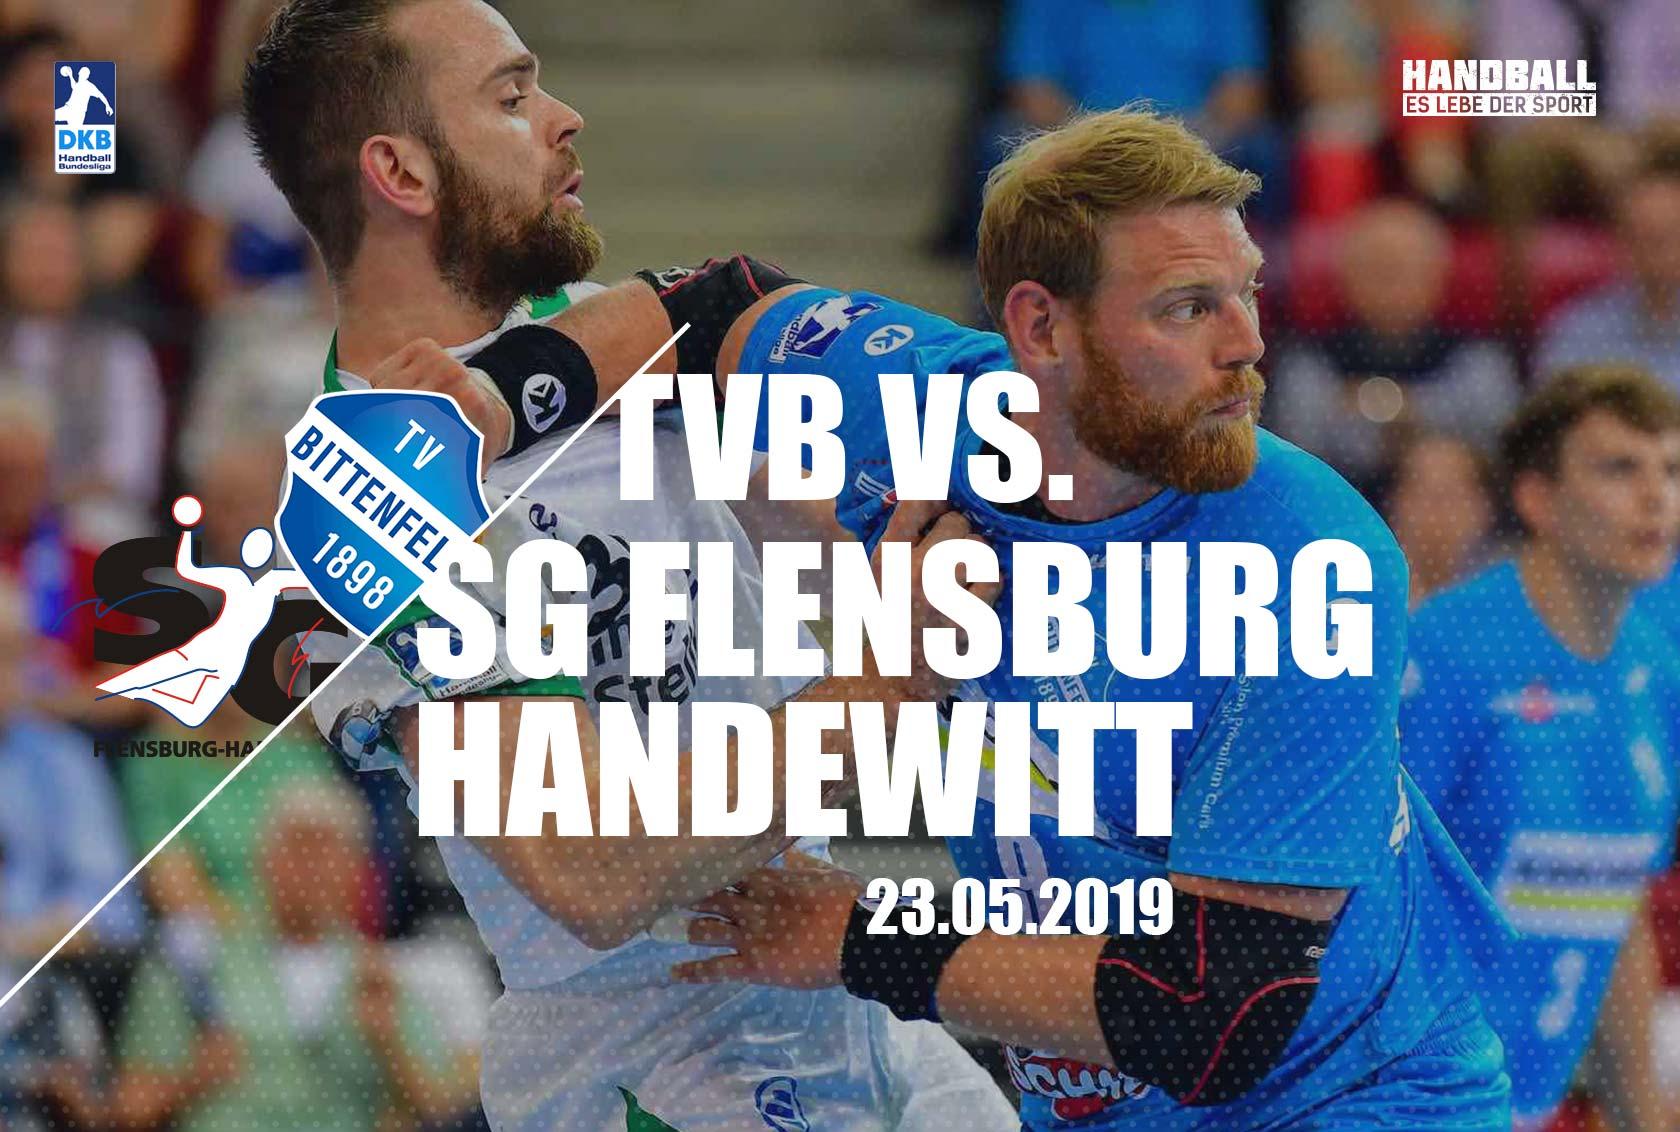 tvb-upcoming-flensburg